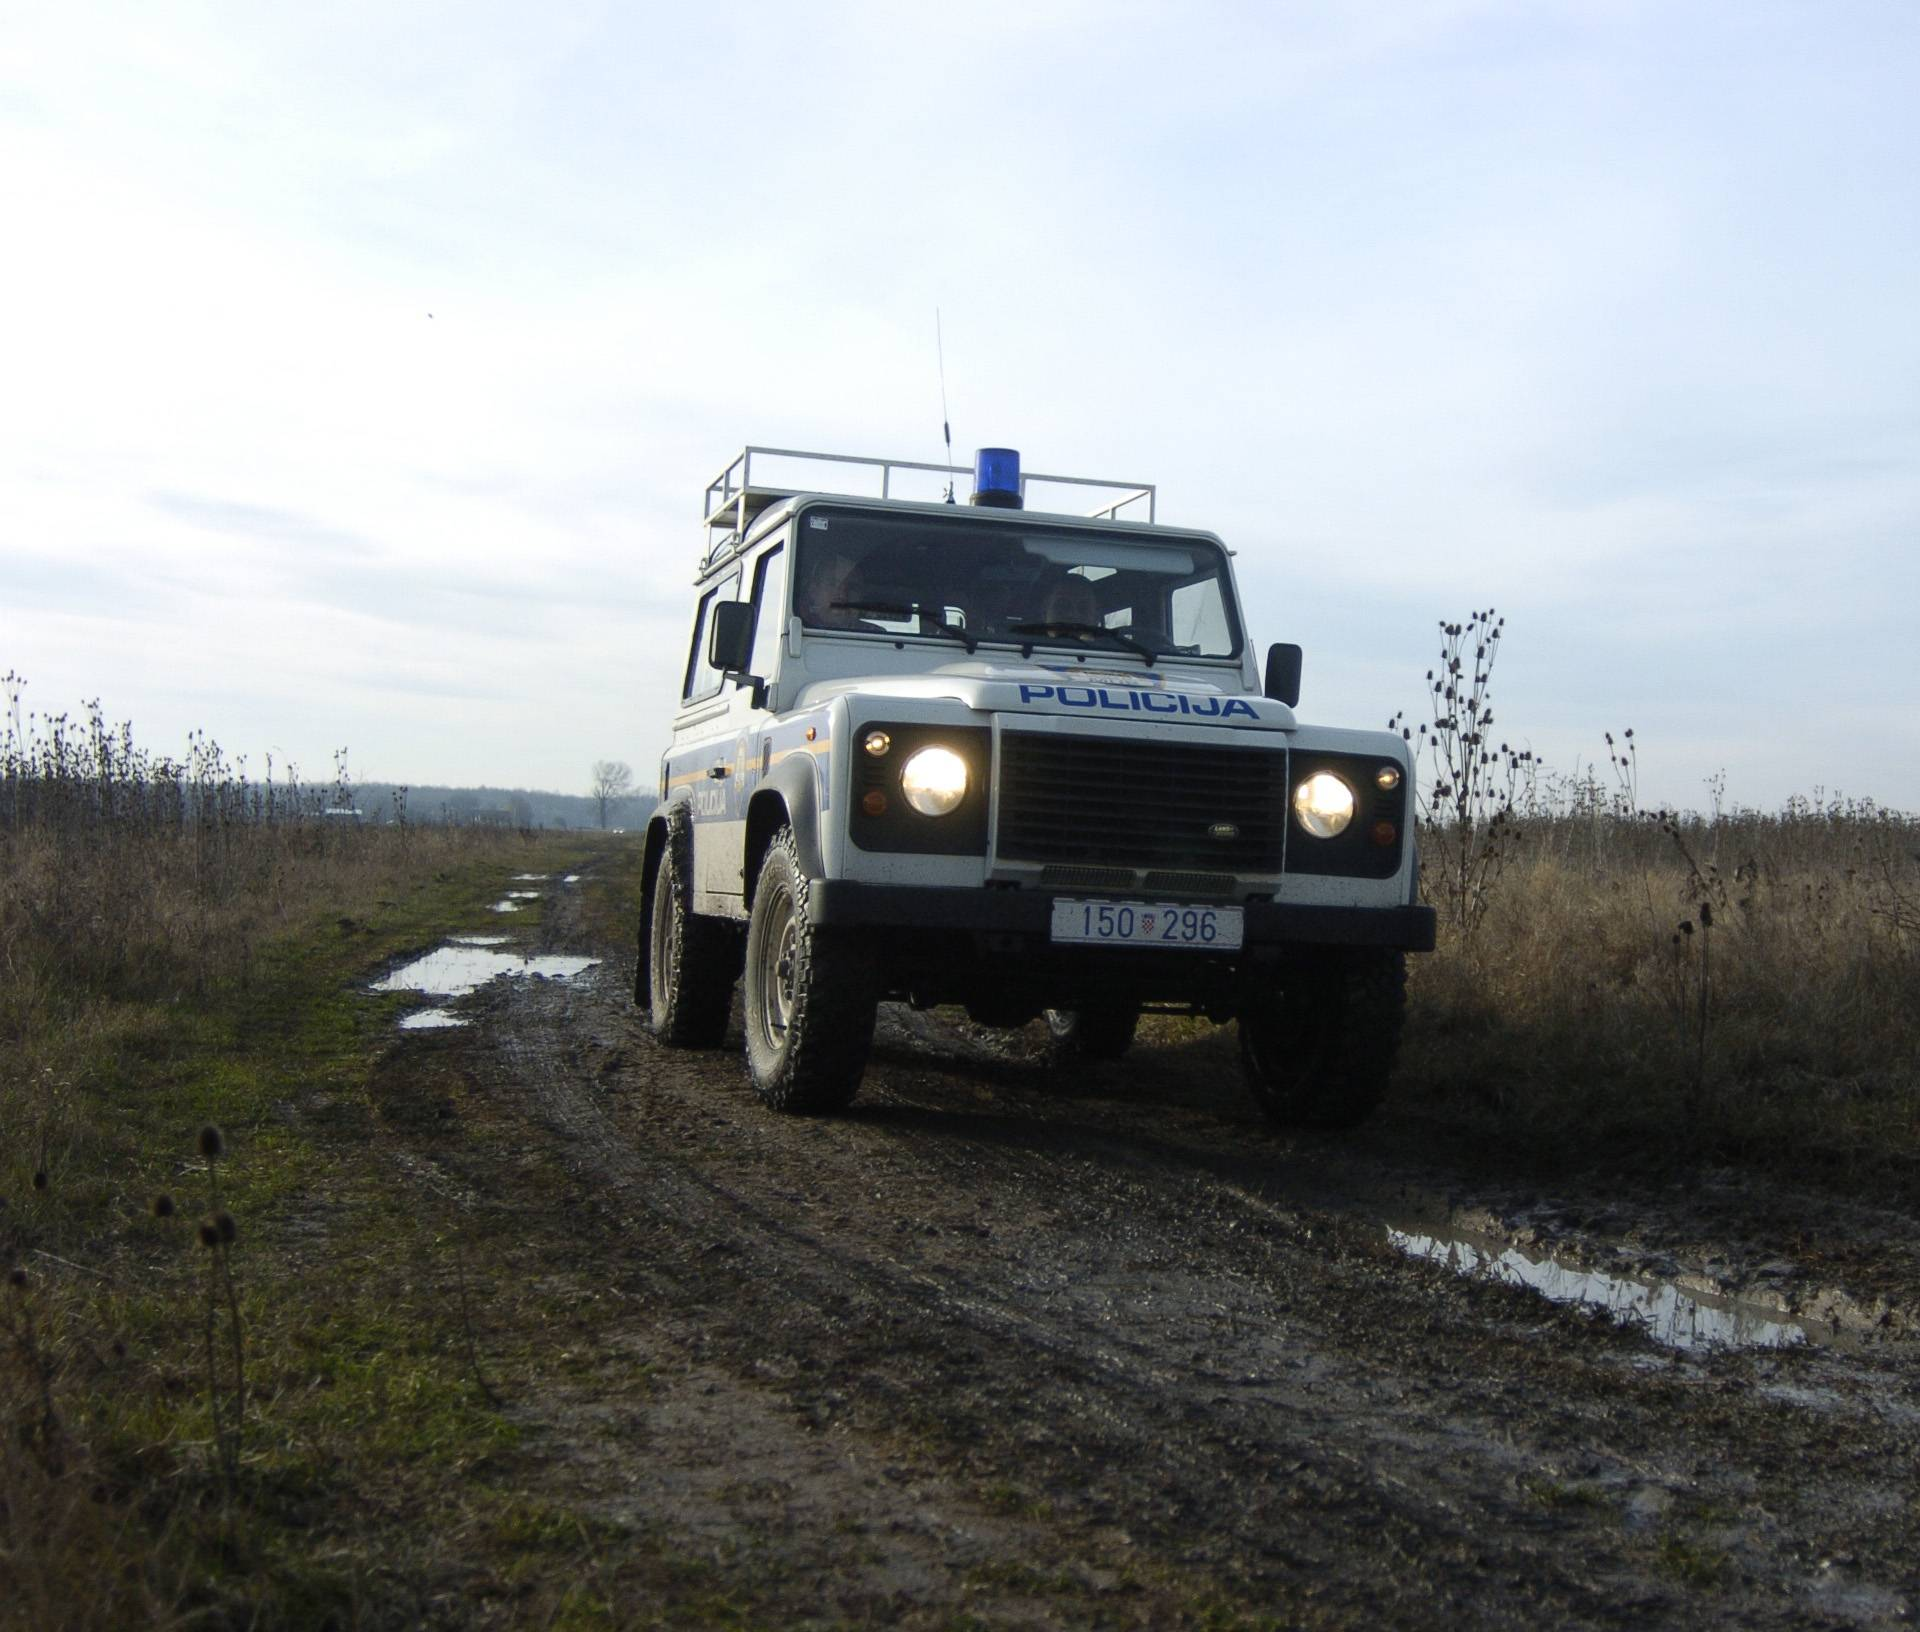 Policajci u terencu po šumi su tražili migrante pa se prevrnuli